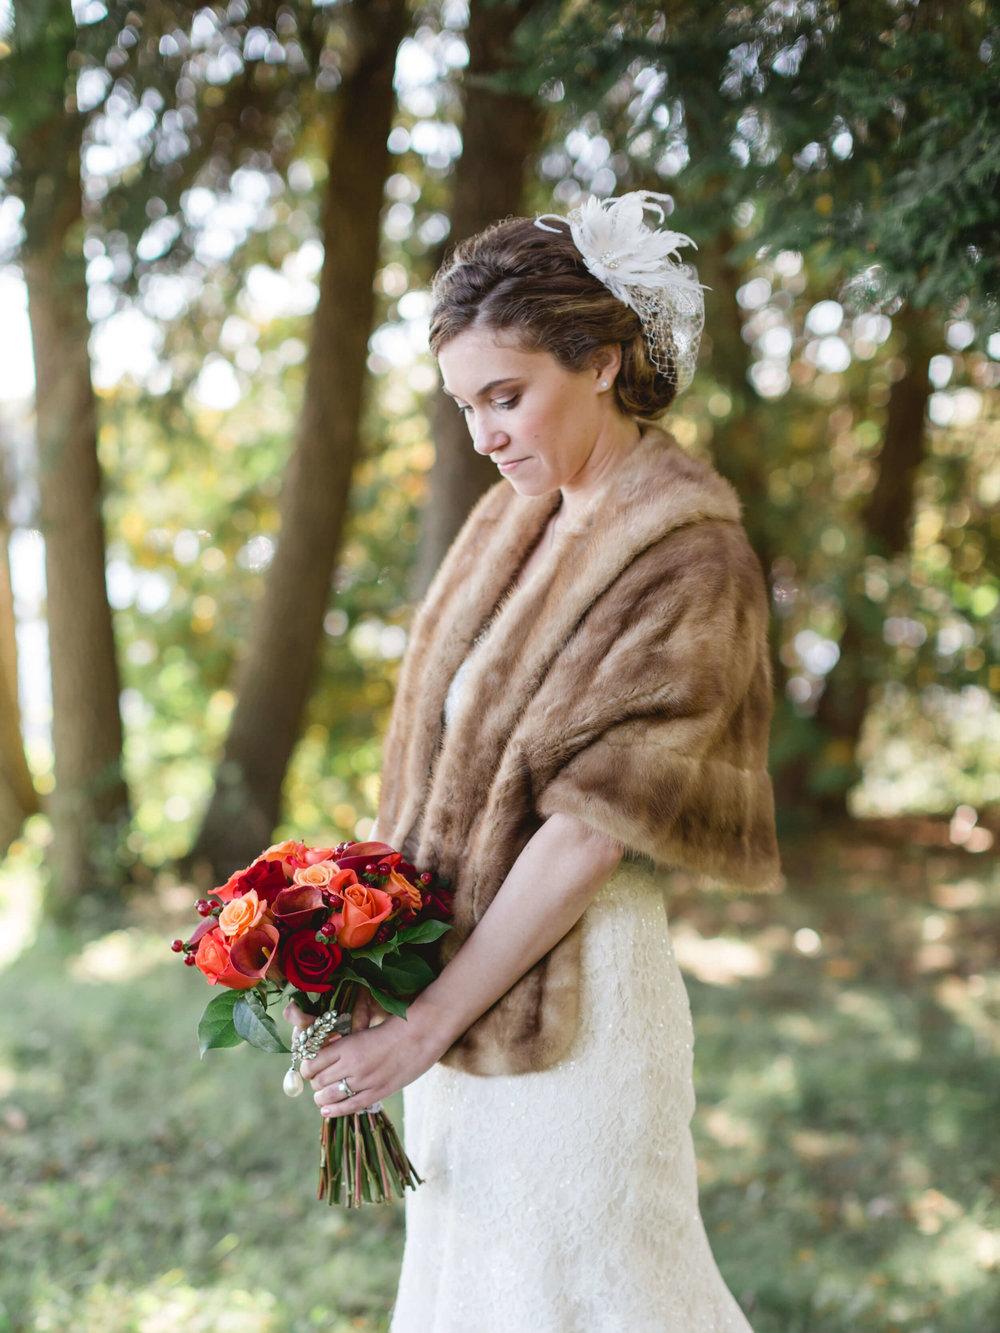 rochelle-louise-photography-acowsay-cinema-wisconsin-wedding-33.jpg